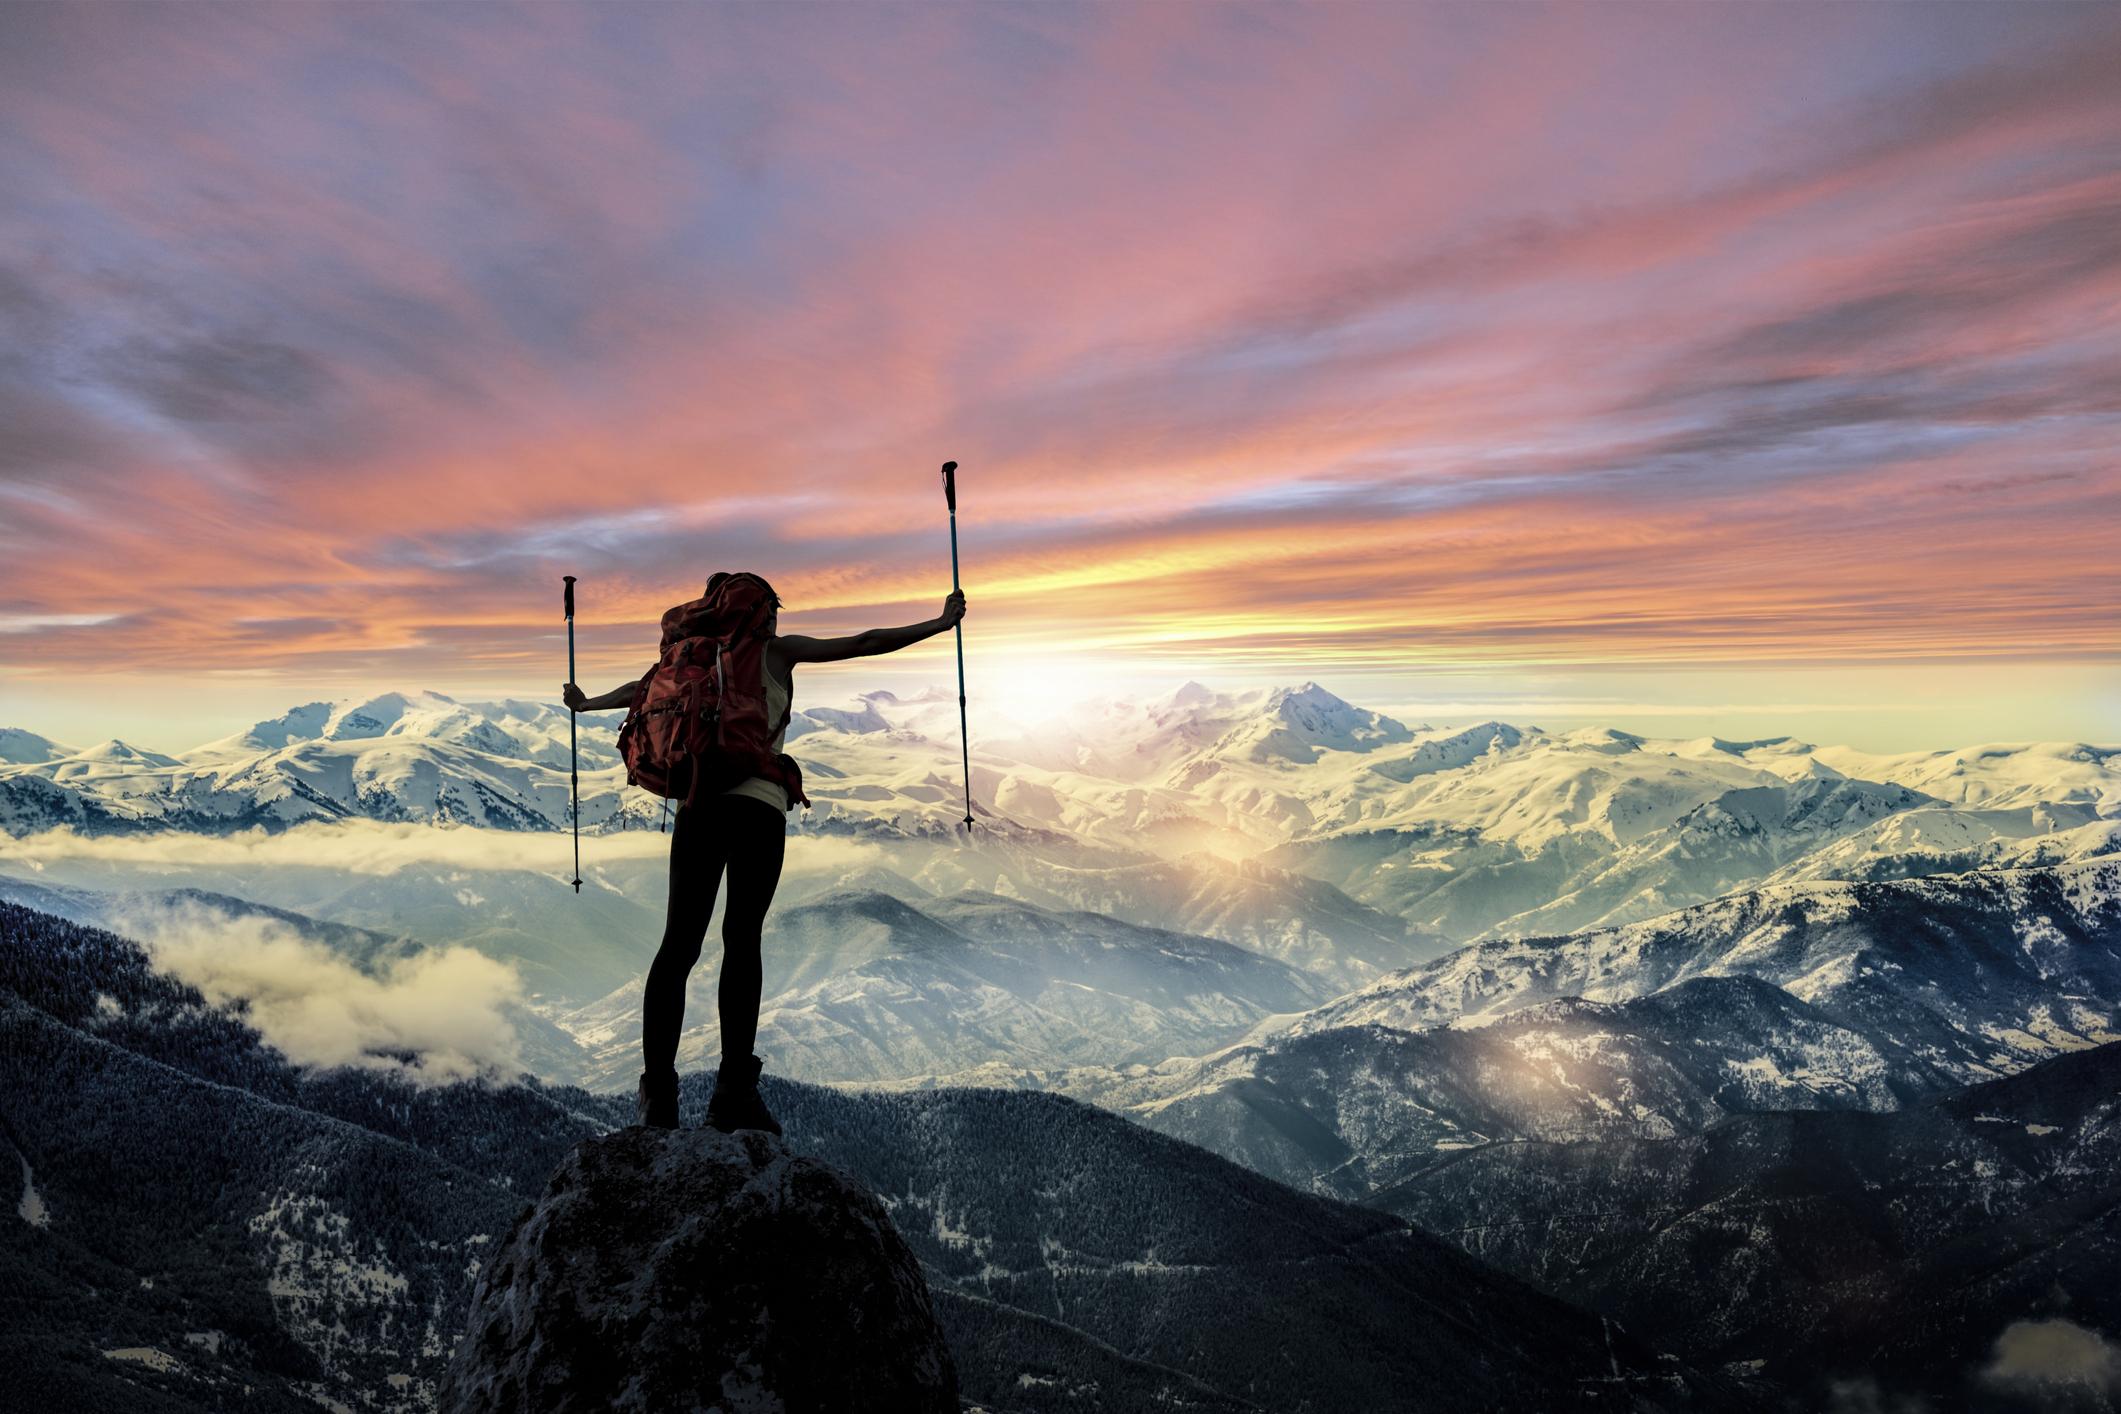 Hiker Silhouette at mountain peak